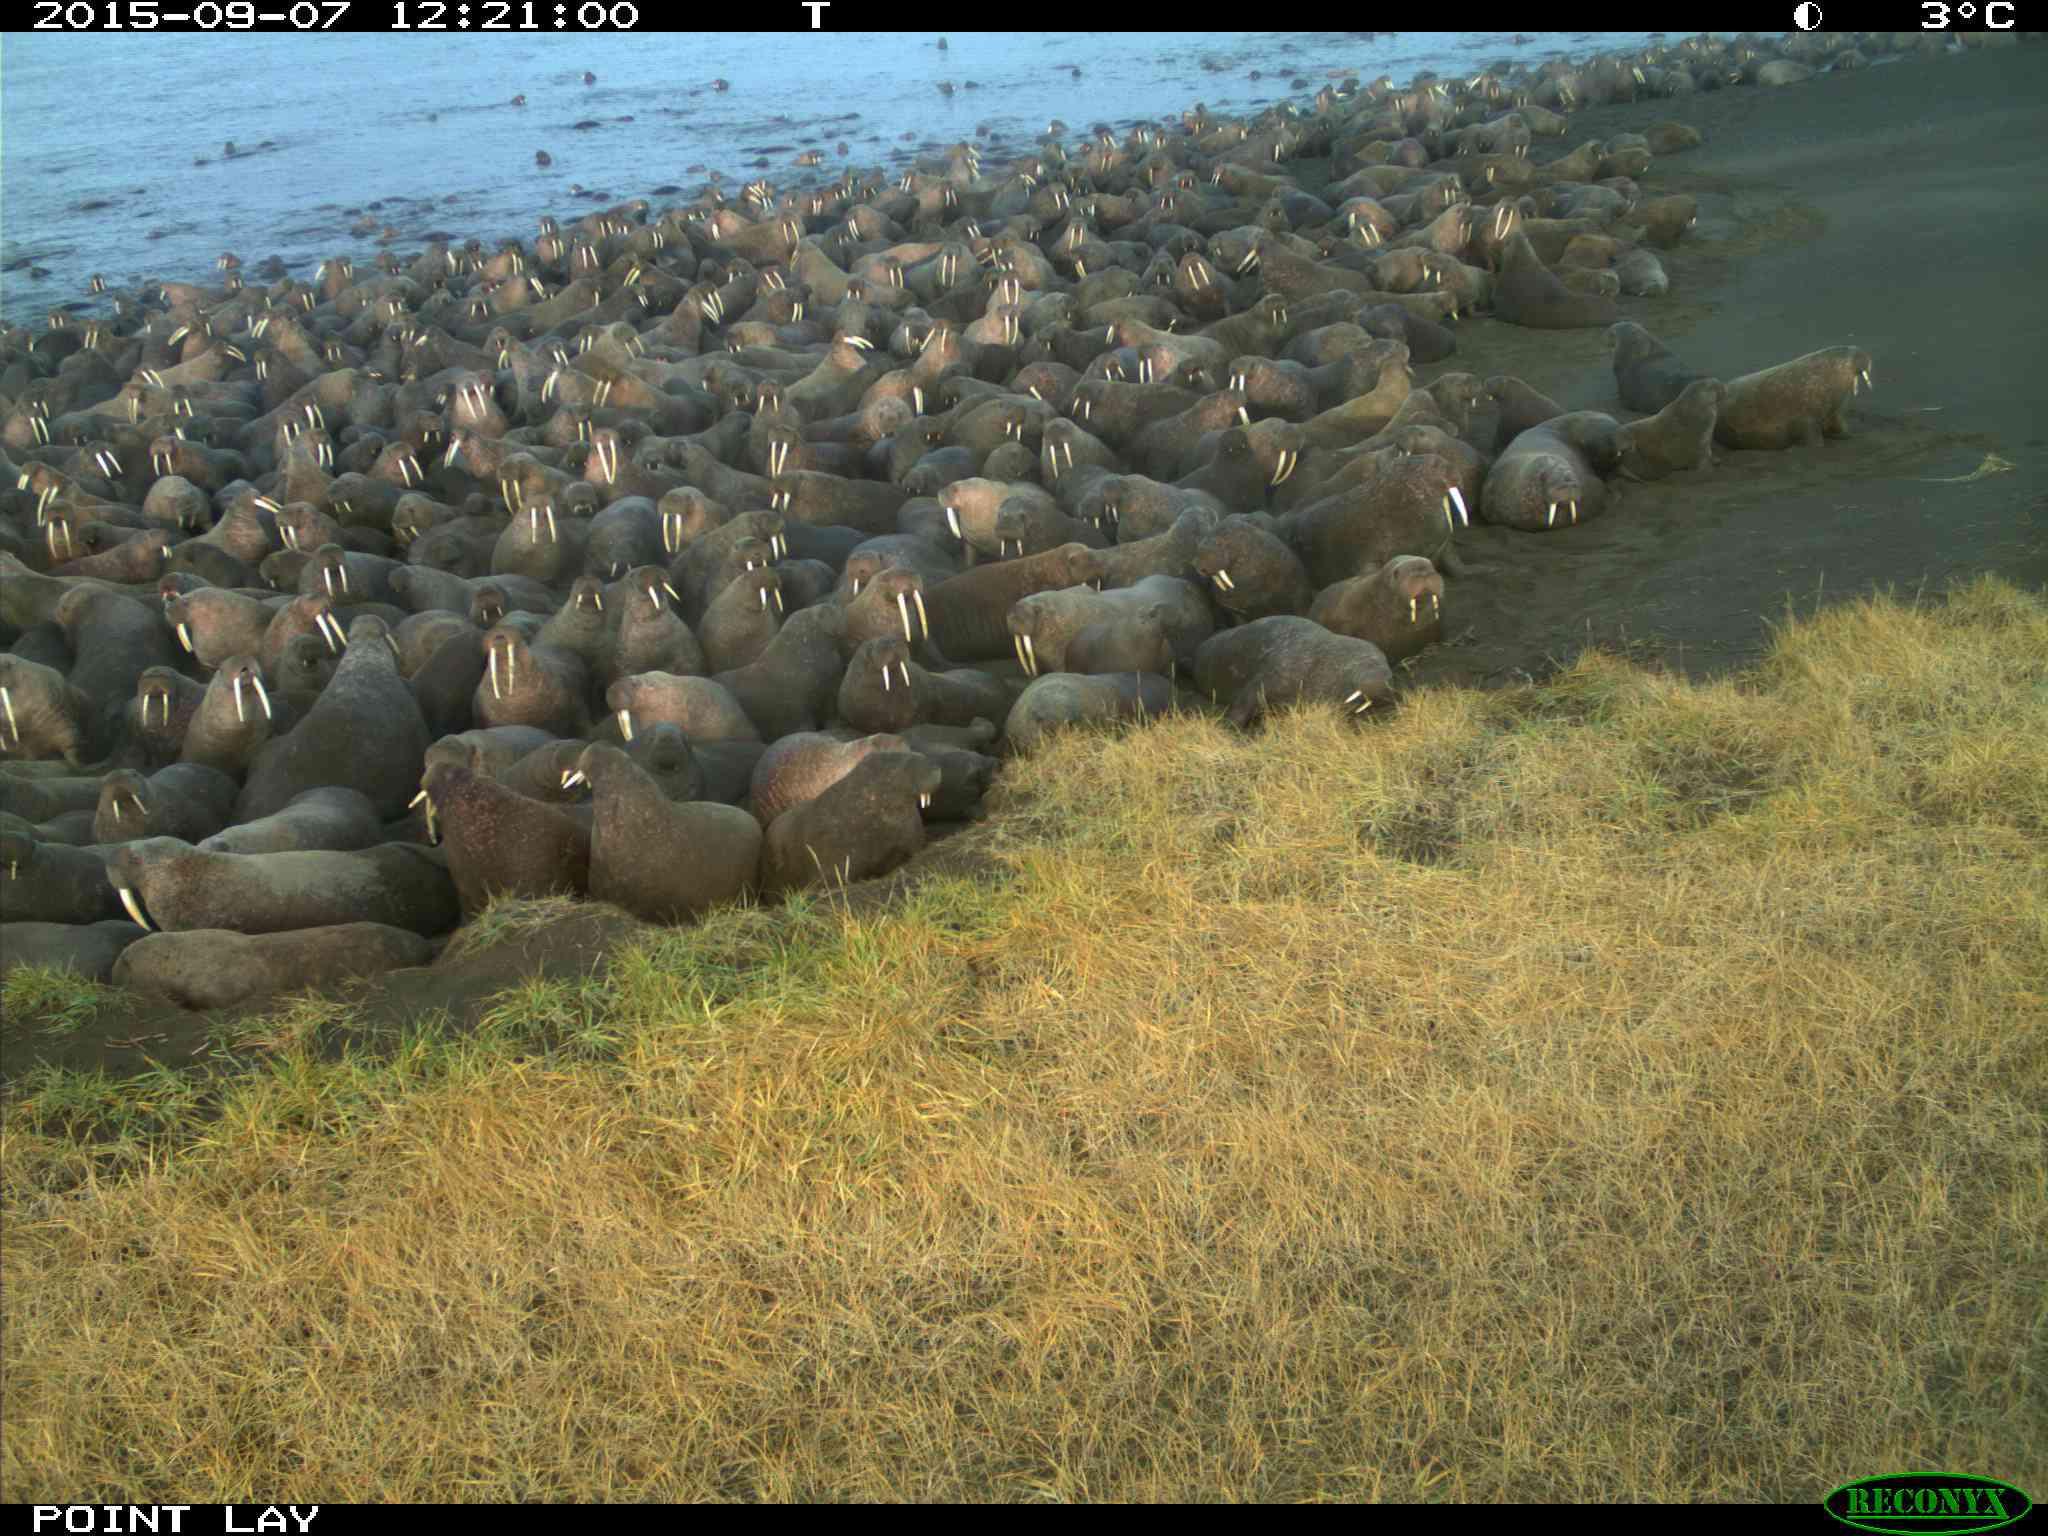 Walruses gather in a haulout on an Alaskan beach.